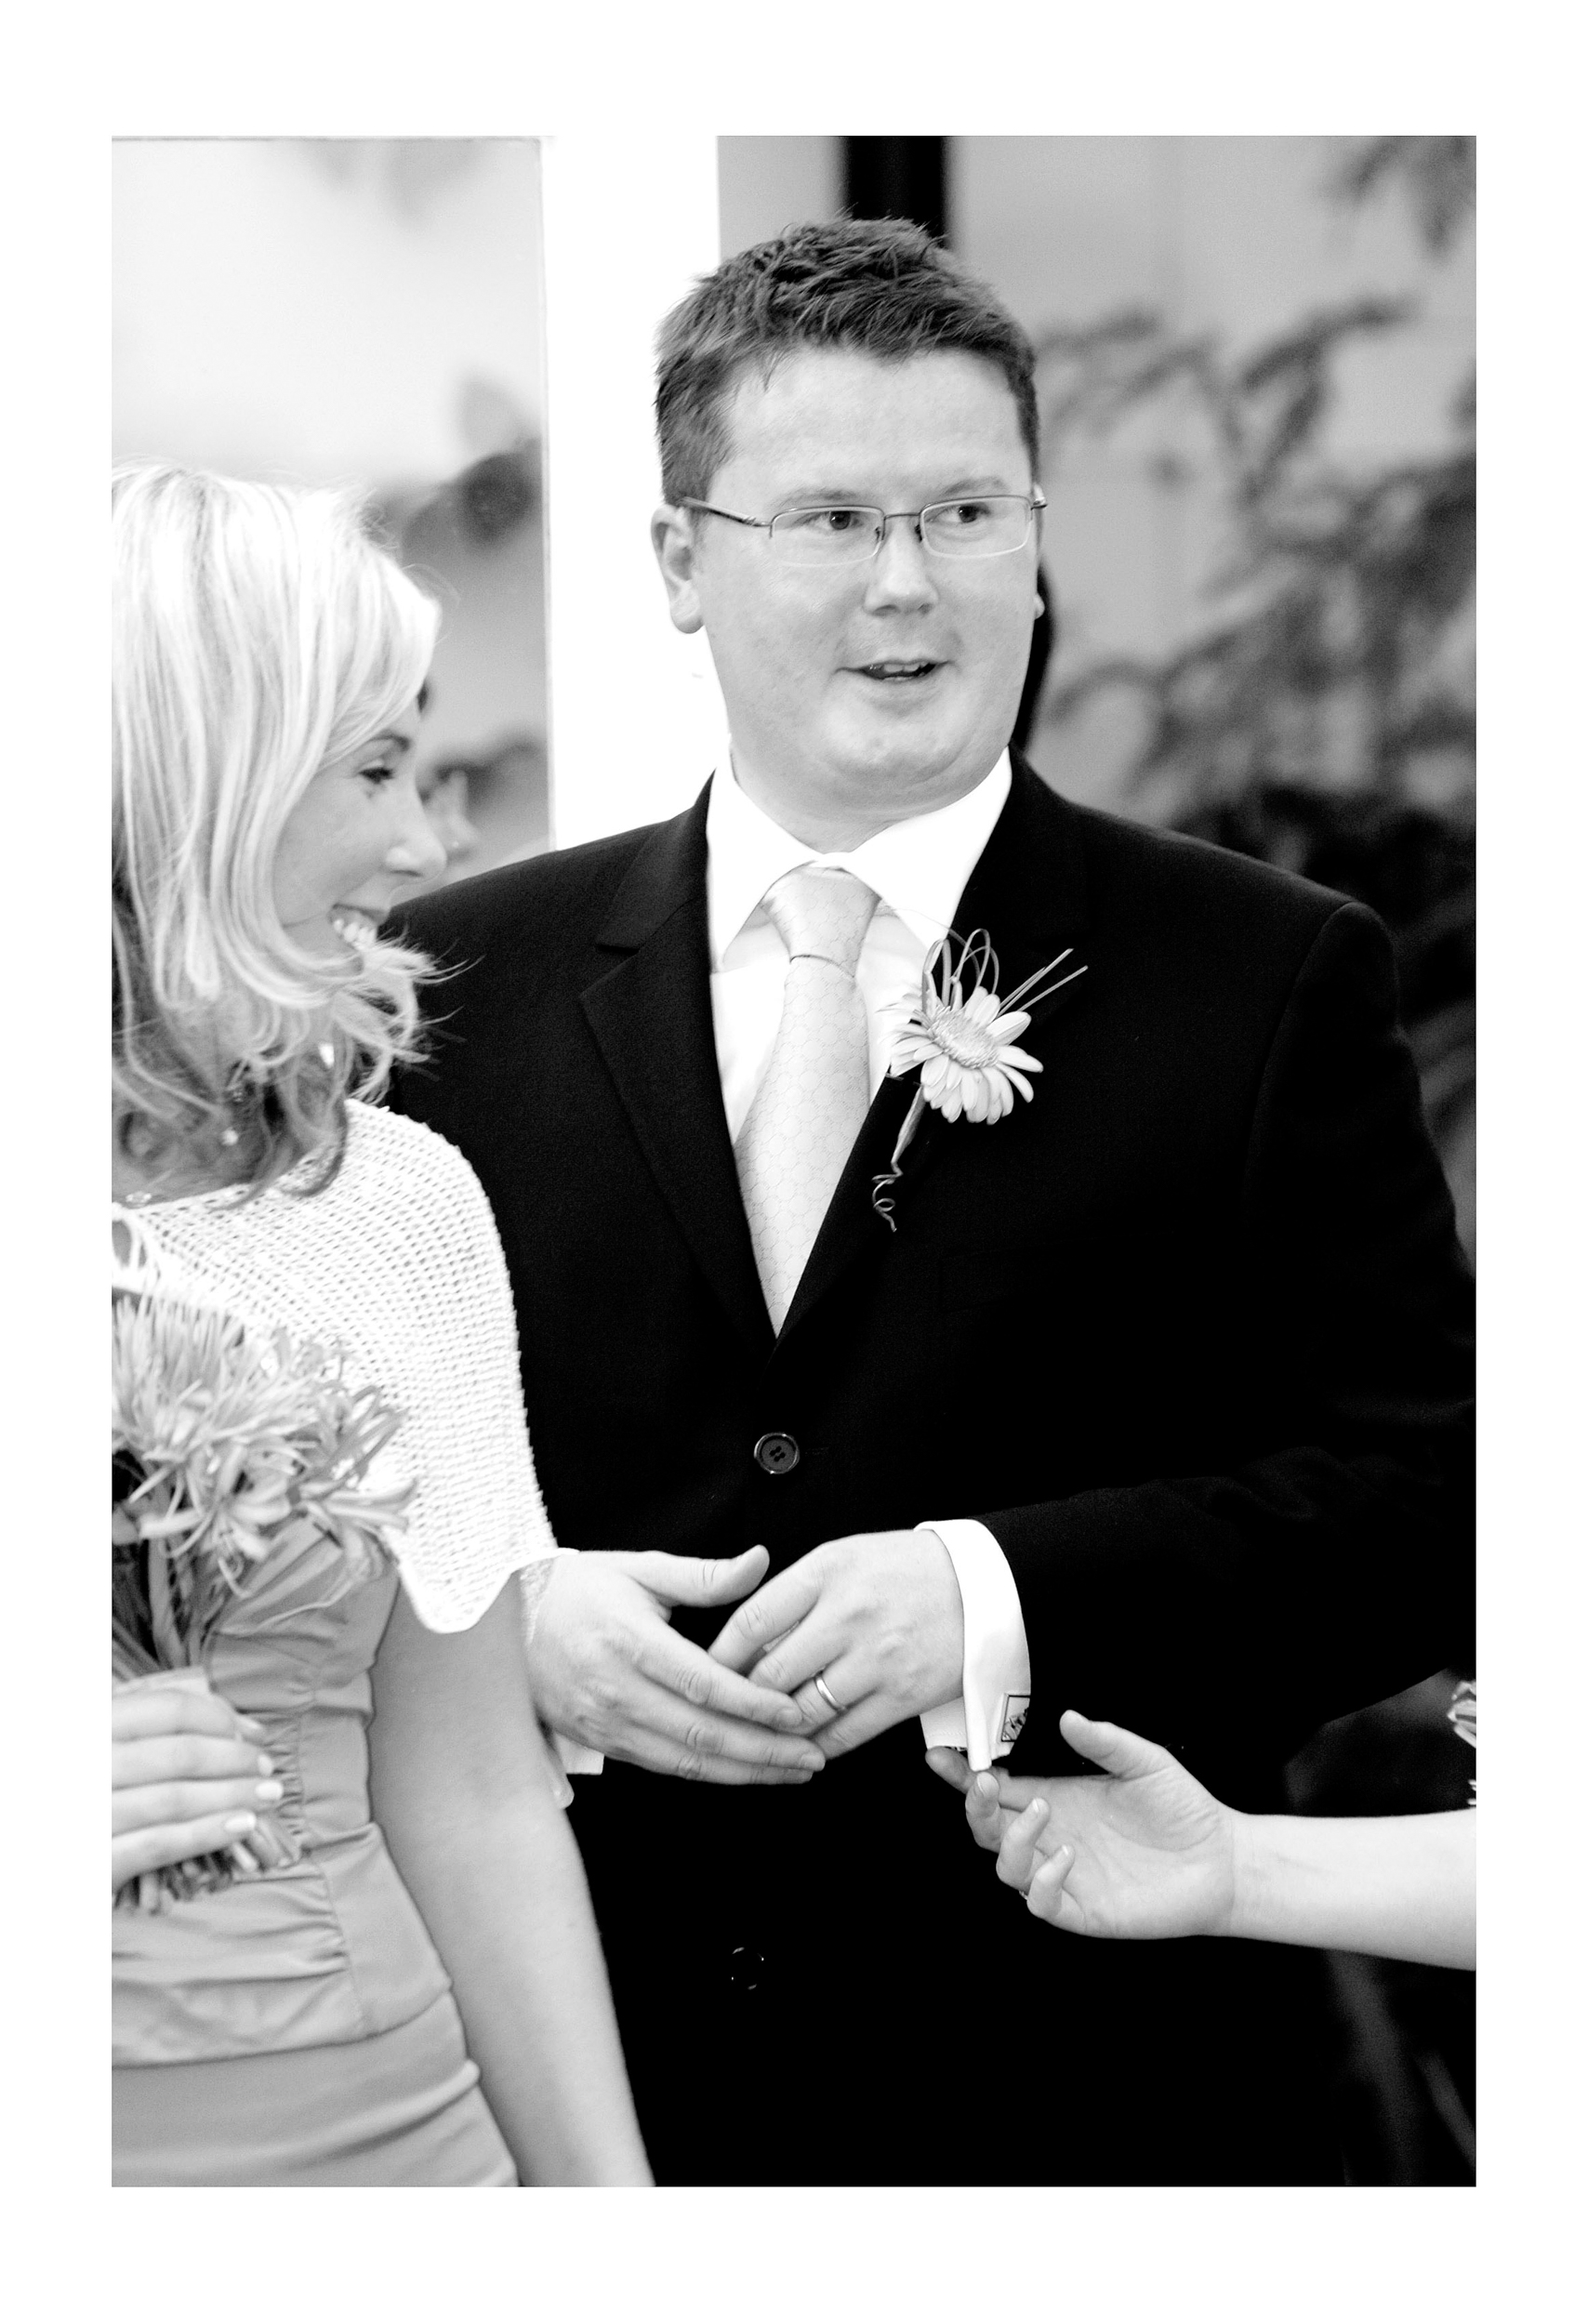 REPORTAGE-WEDDING-PHOTOGRAPHY-SET-UK-22.jpg